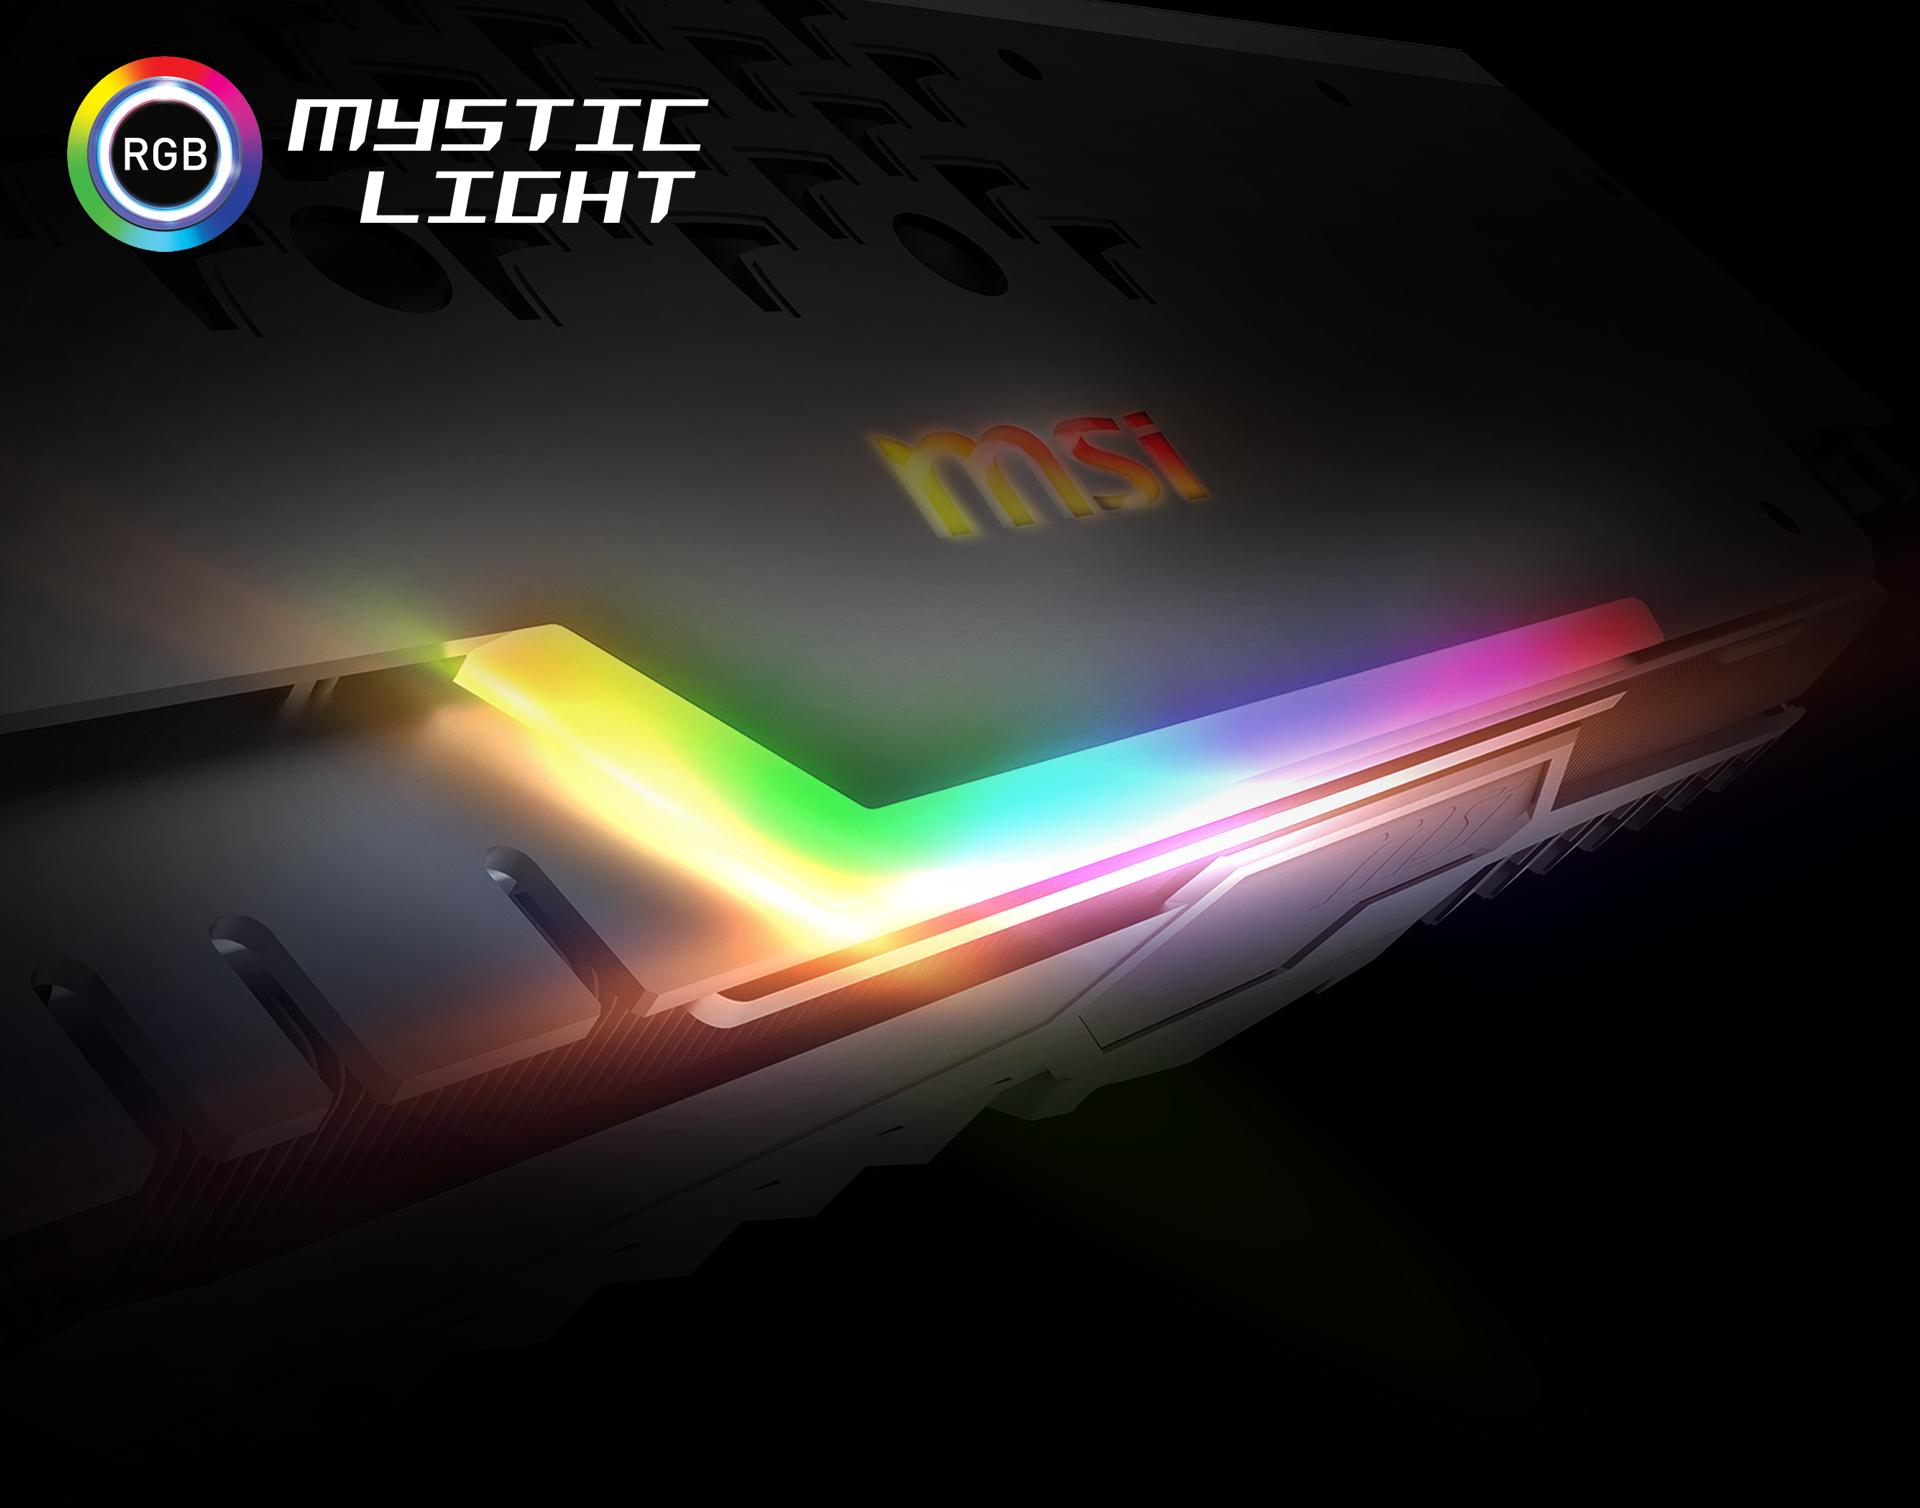 https://asset.msi.com/global/picture/image/feature/vga/NVIDIA/GTX1080Ti/Trio/TRIO-RGBsoftware-2.jpg